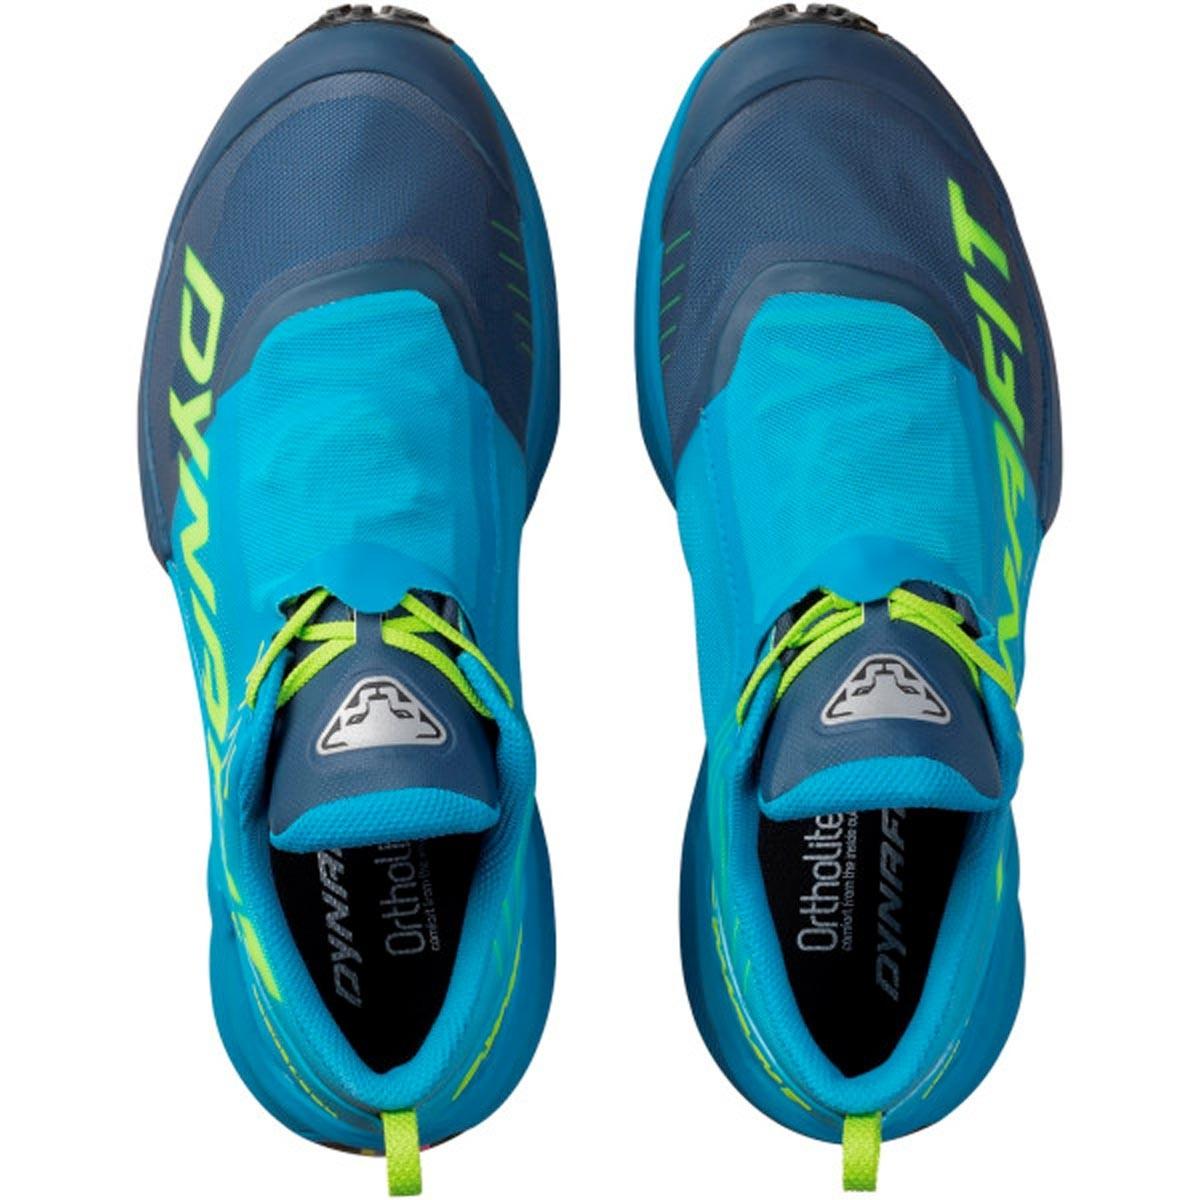 Dynafit Ultra 100, zapatilla de trail running para ultras - foto 4